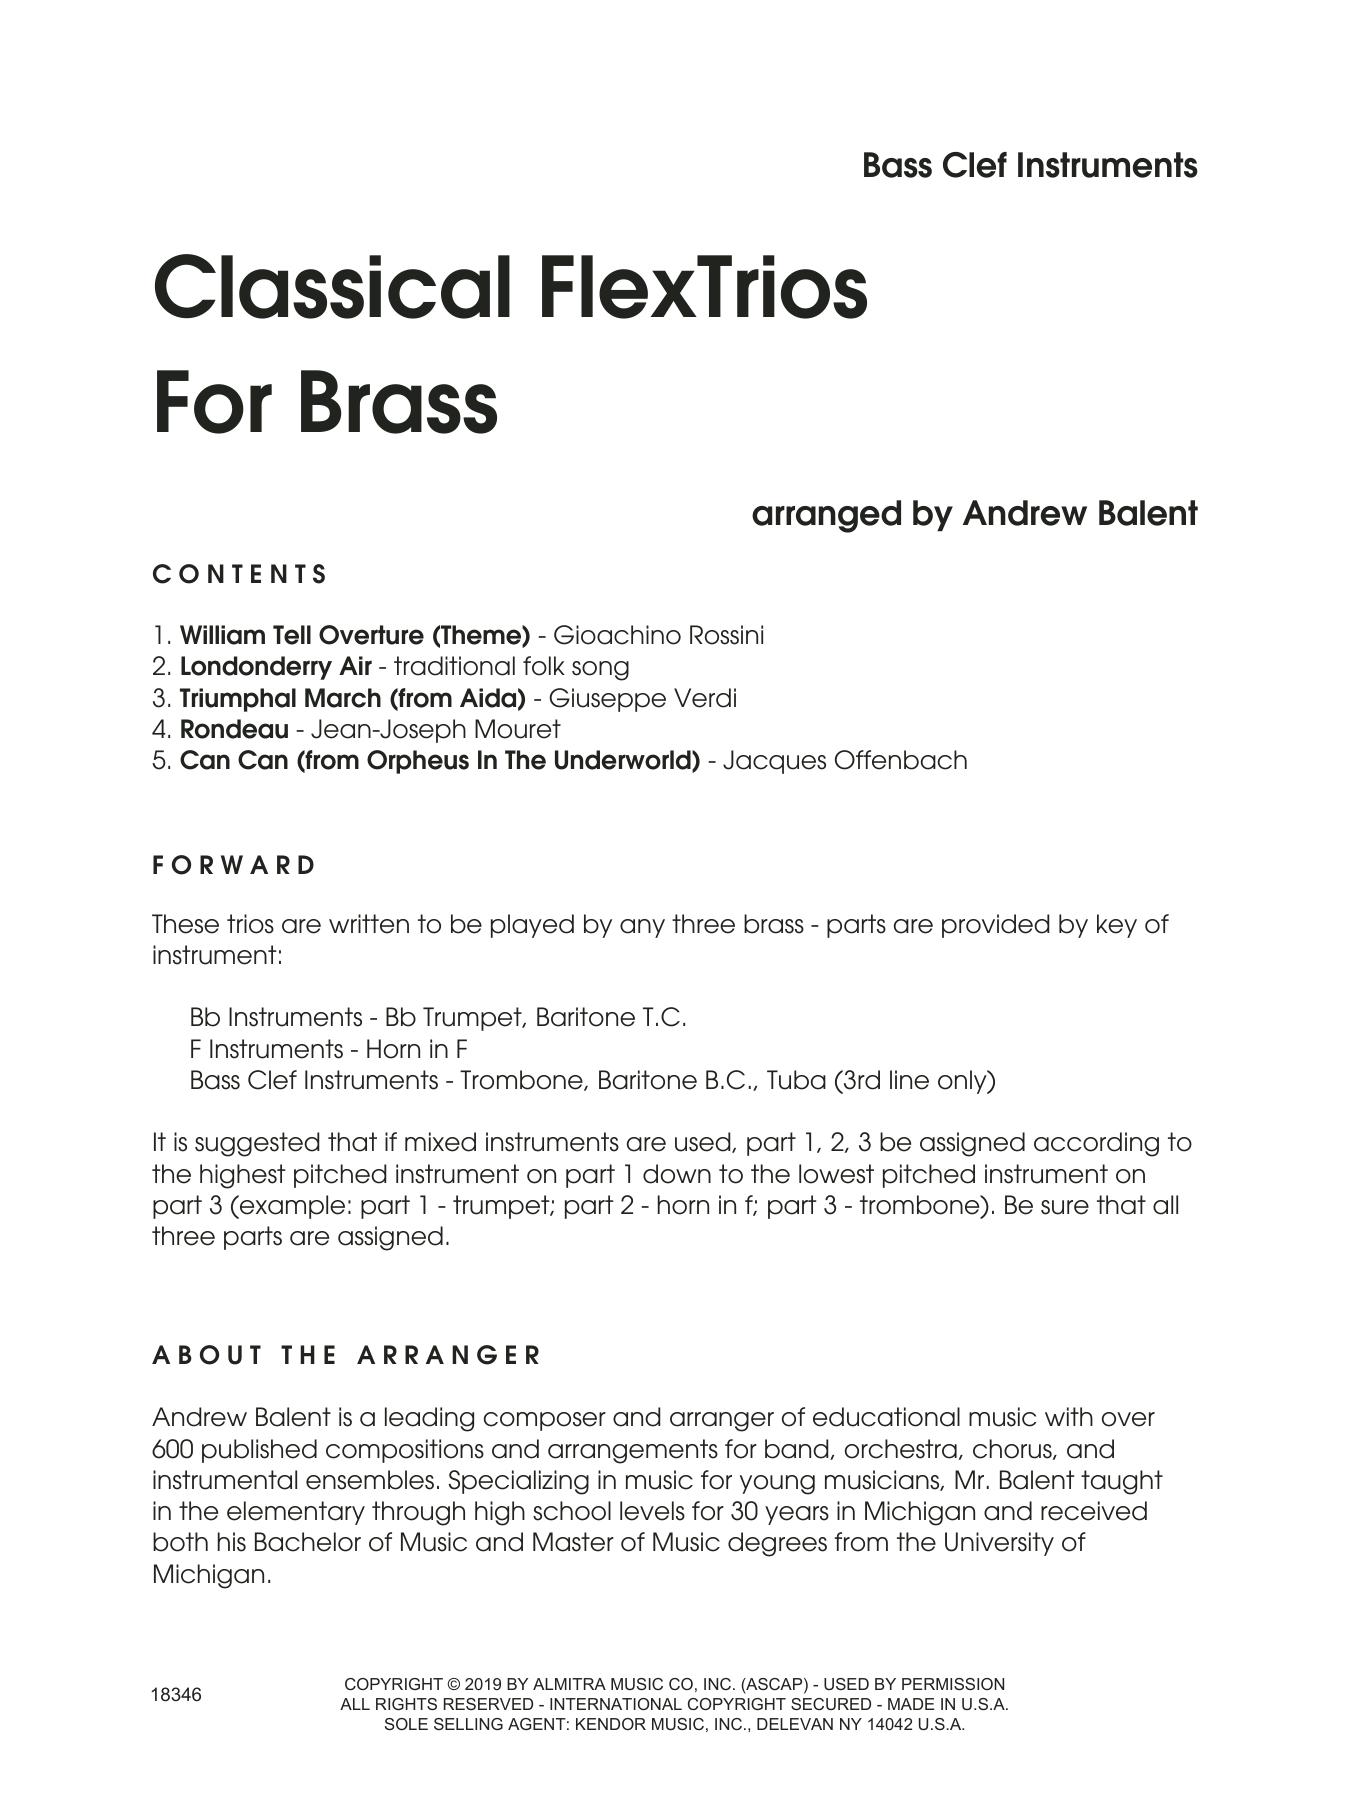 Classical Flextrios For Brass (arr. Andrew Balent) - C Bass Clef Sheet Music